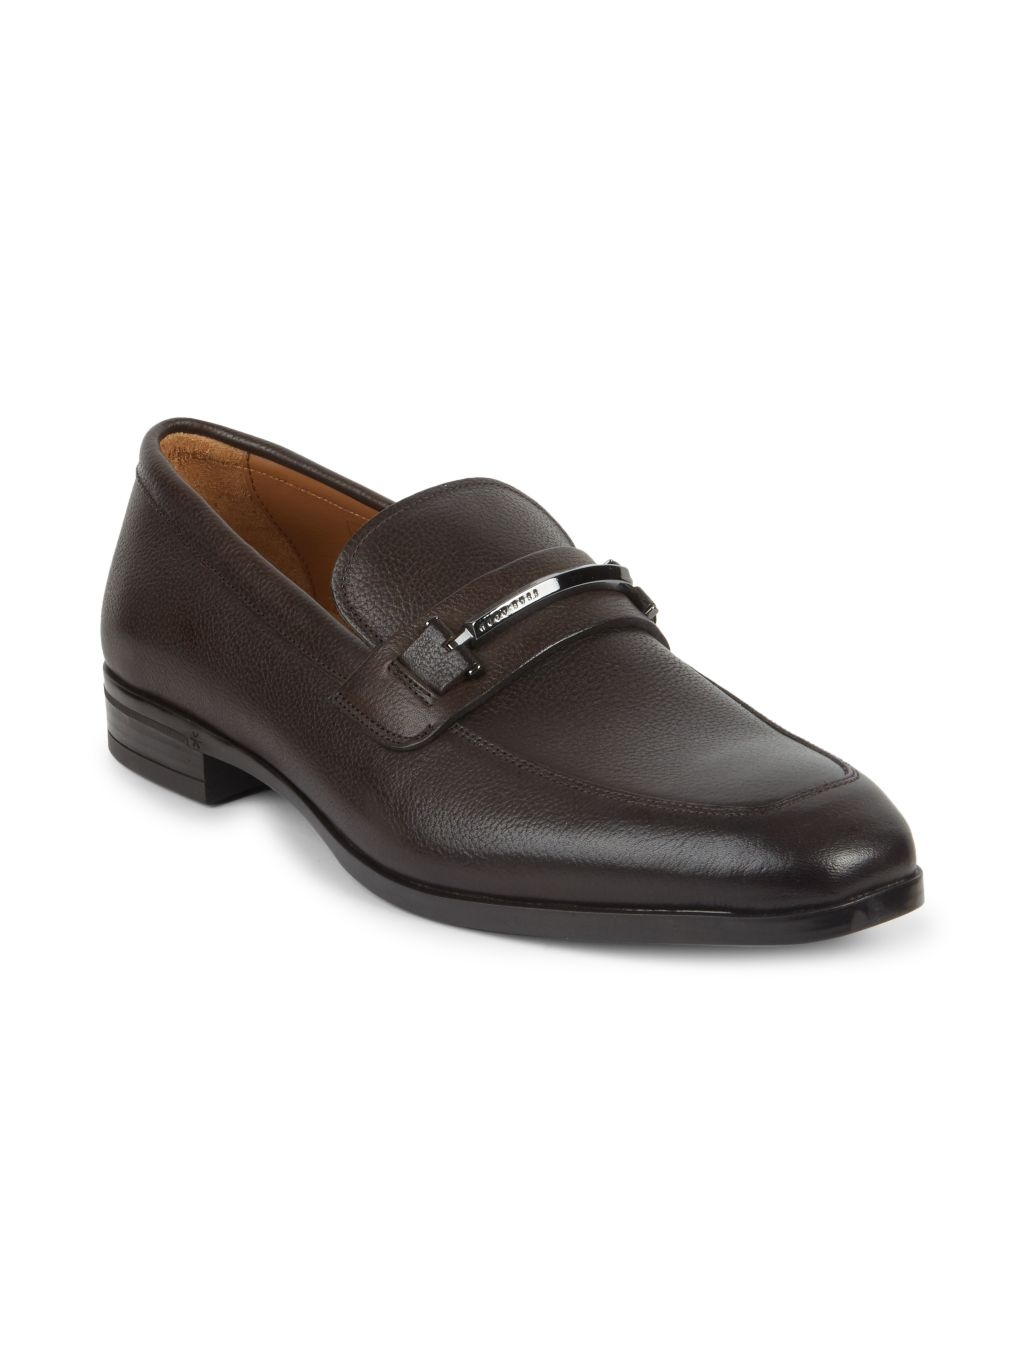 Boss Hugo Boss Portland Pebbled Leather Loafers